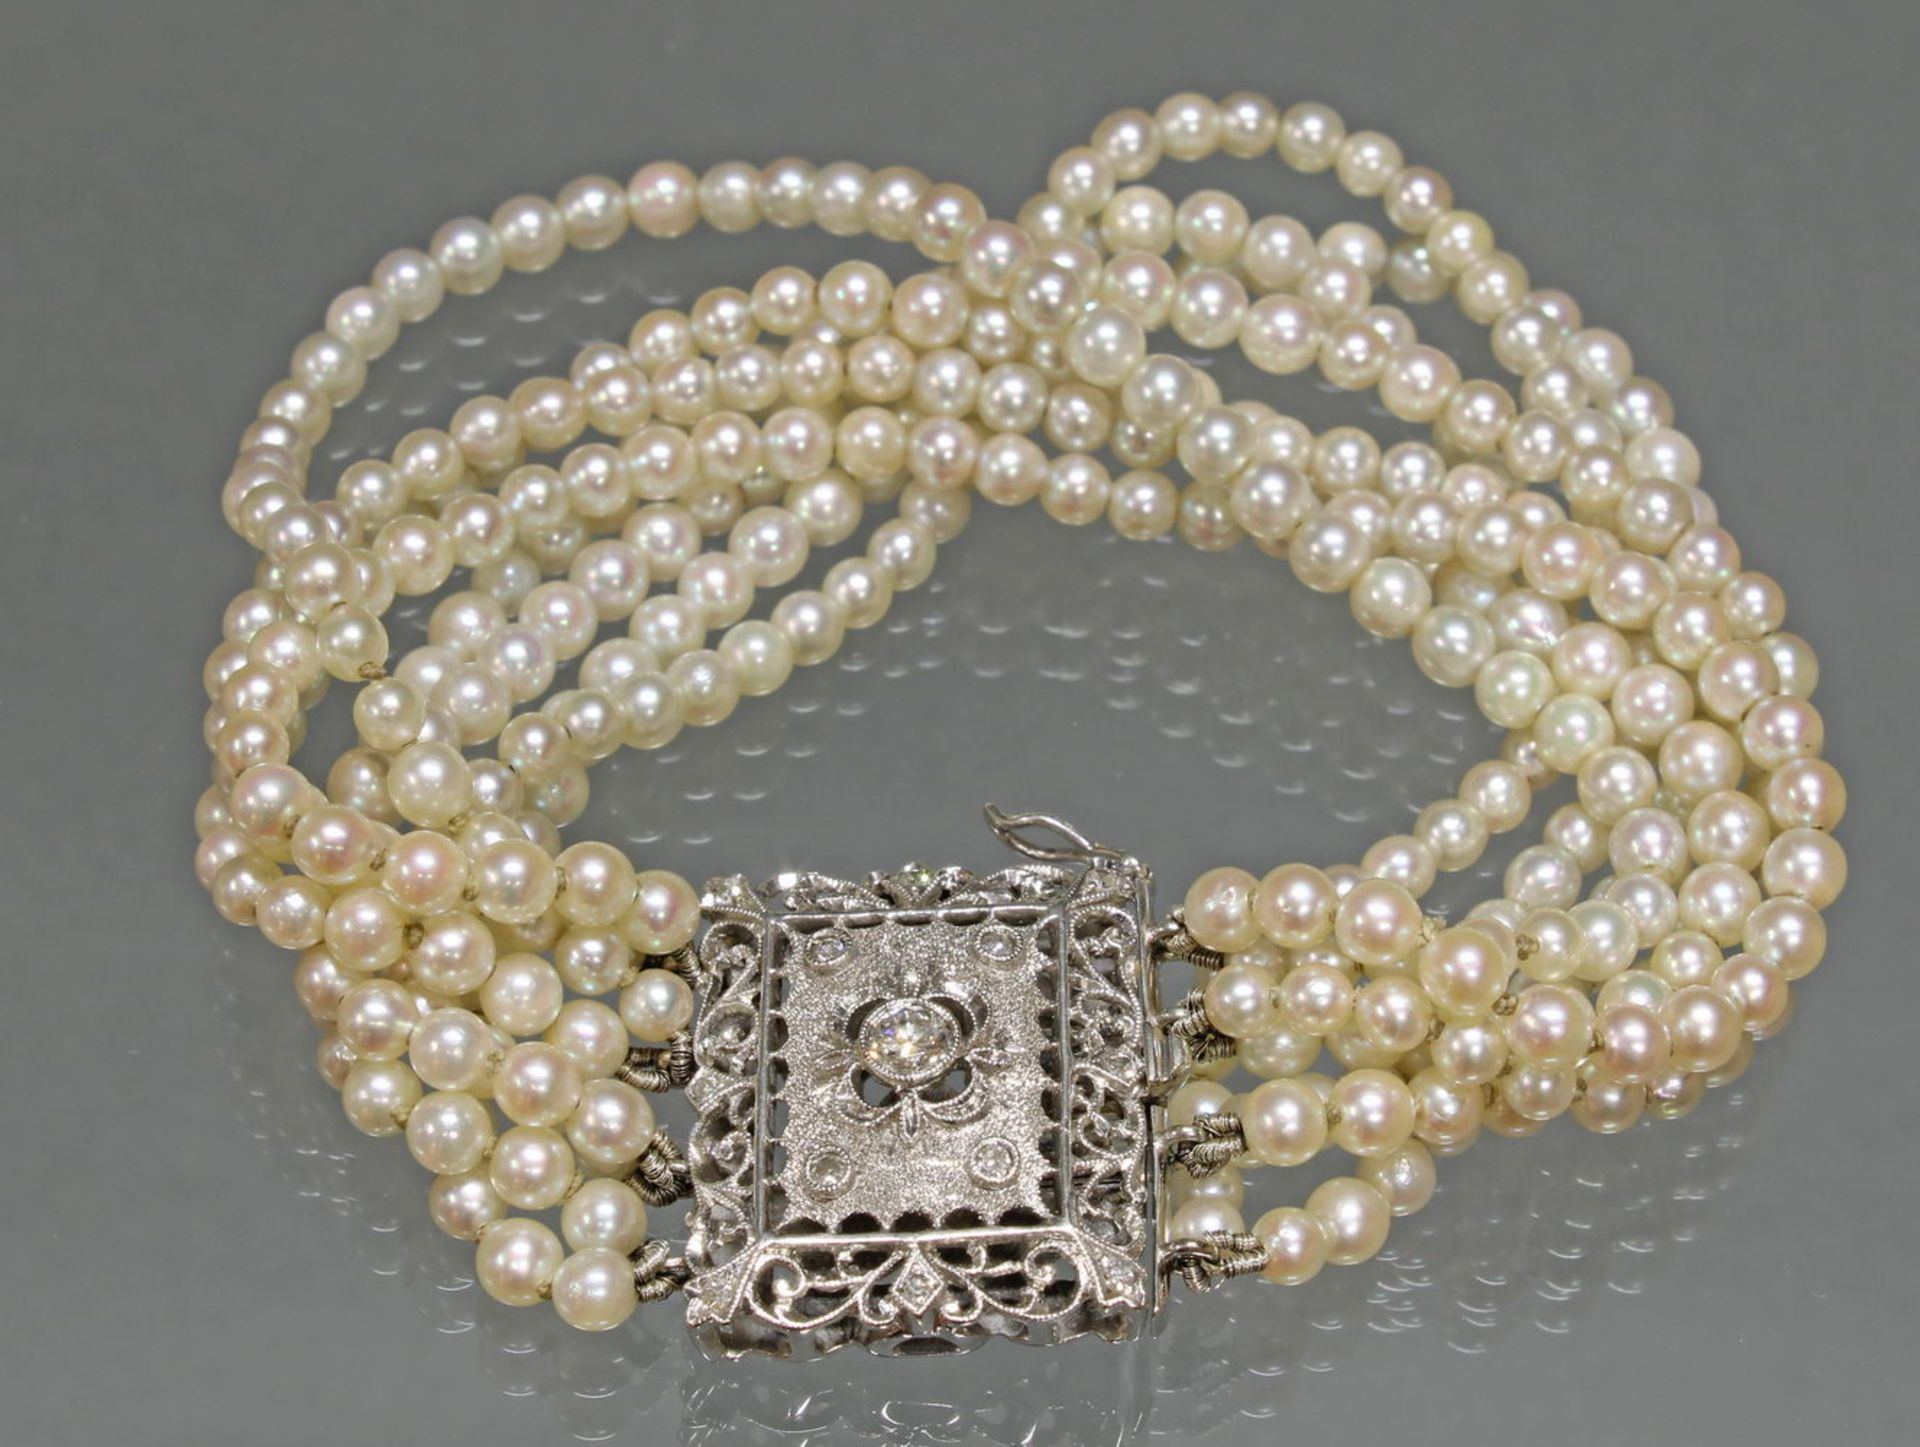 Perlarmband, achtreihig, ca. 350 Akoya-Zuchtperlen ø ca. 3.5 mm, Schließe WG 750, á jour gearbei